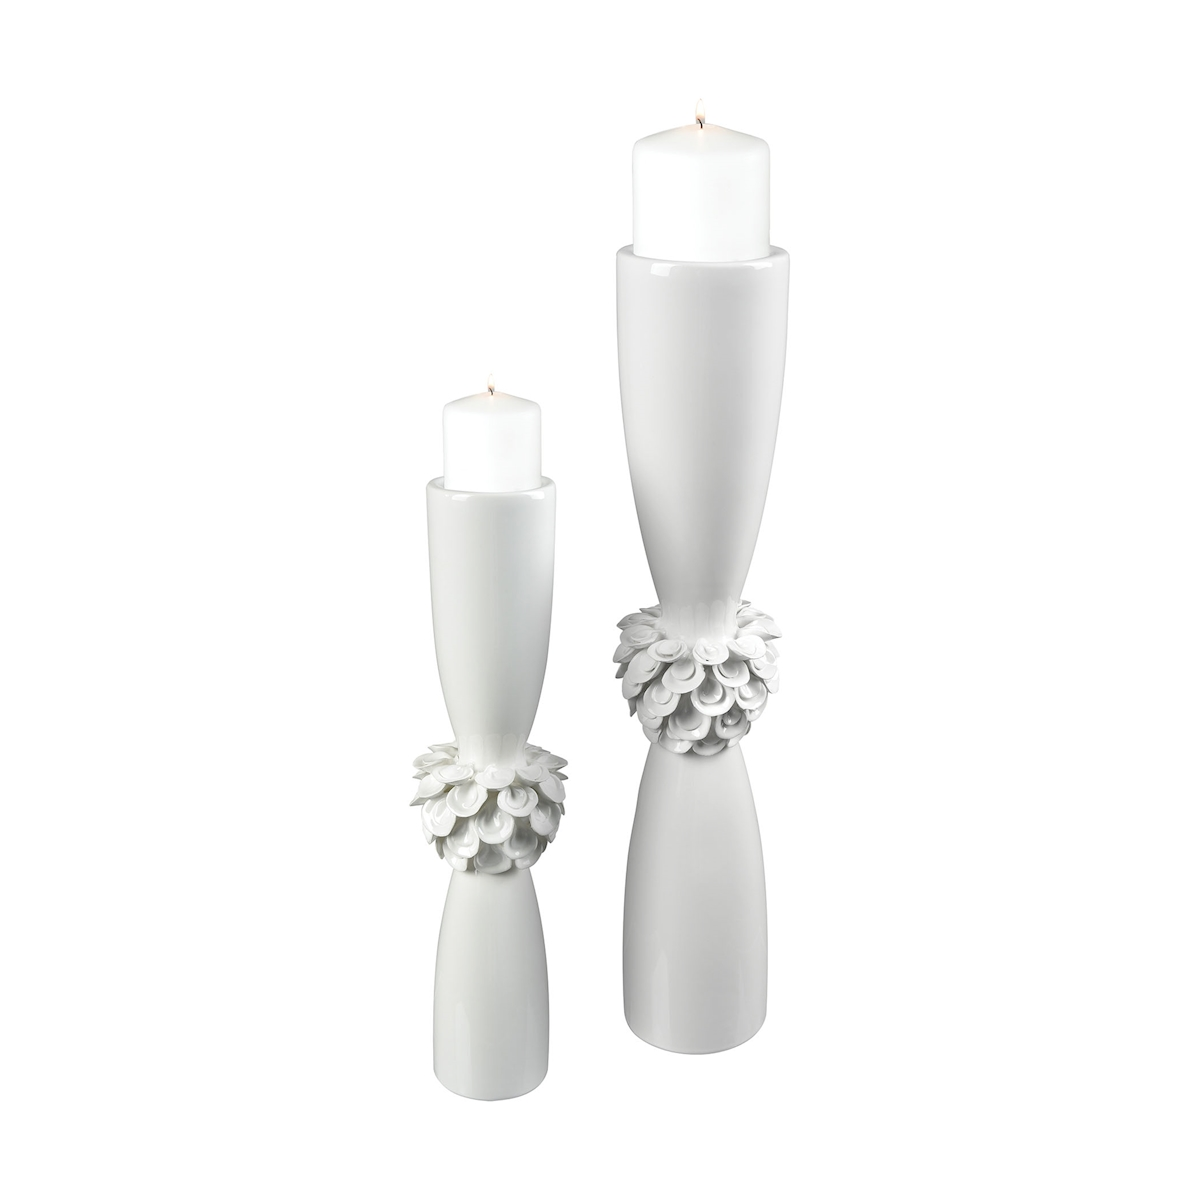 Tranquillo Candle Holder | Elk Home